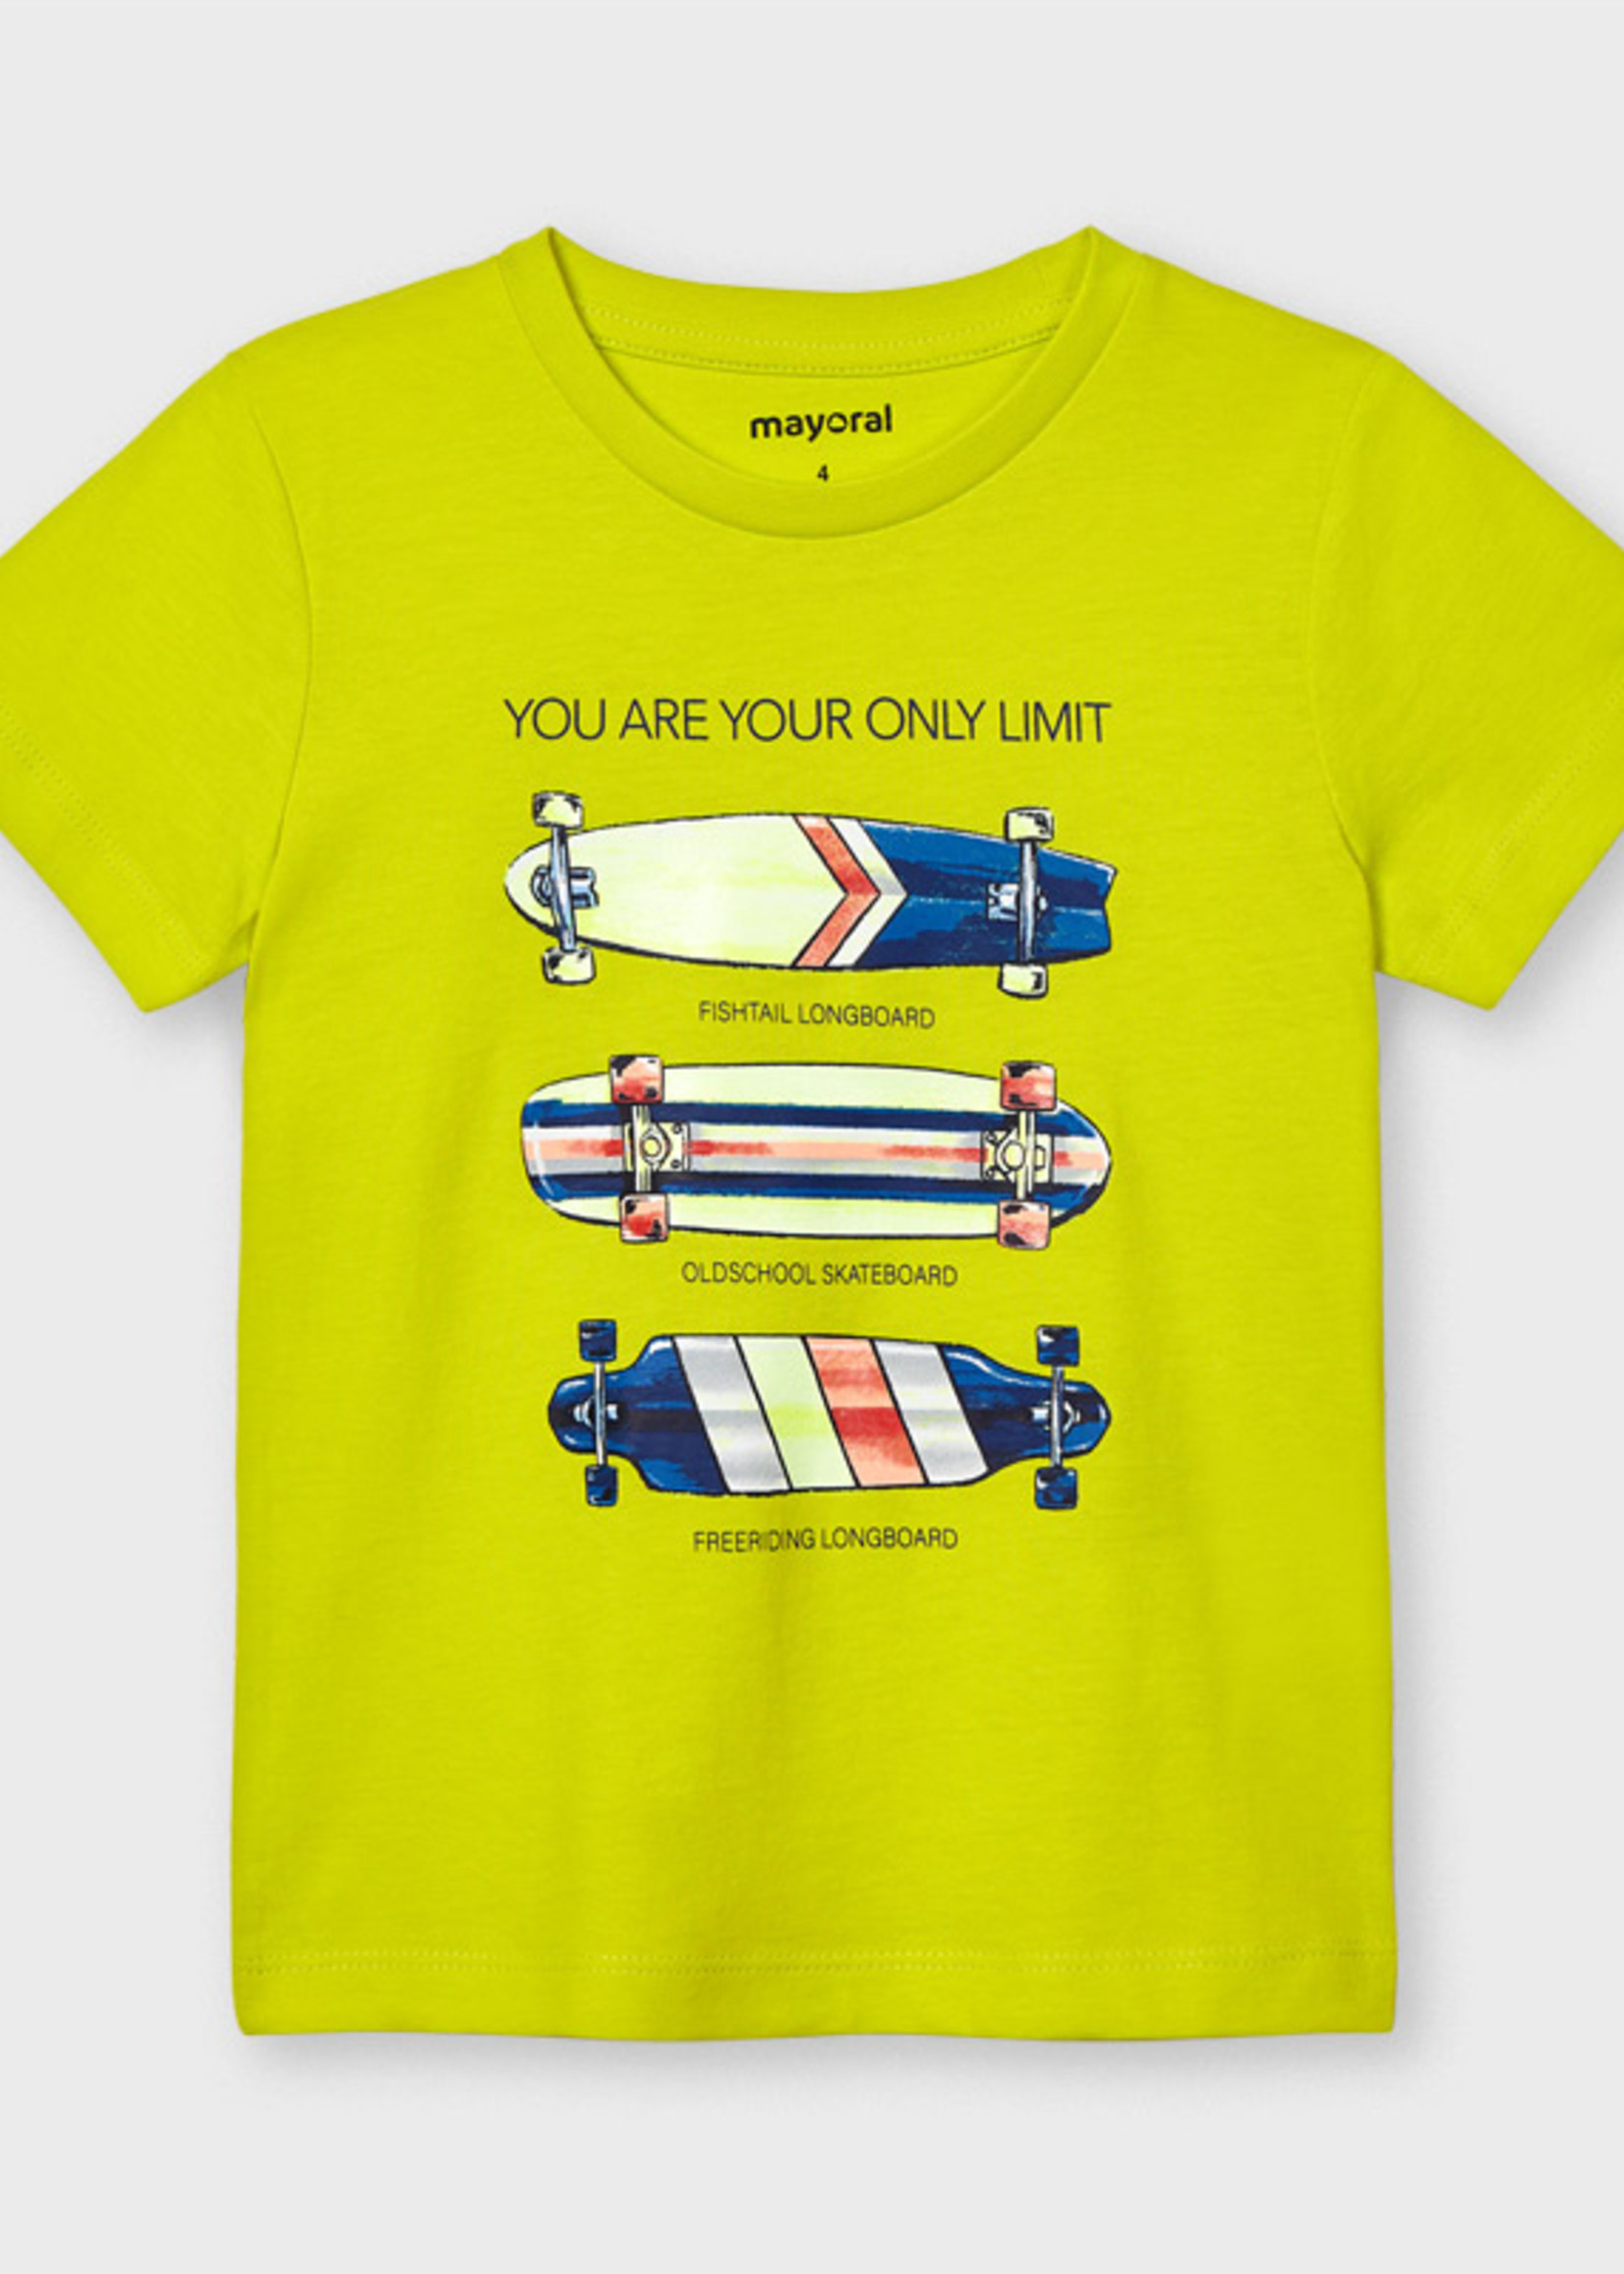 Mayoral Mayoral skateboards s/s t-shirt